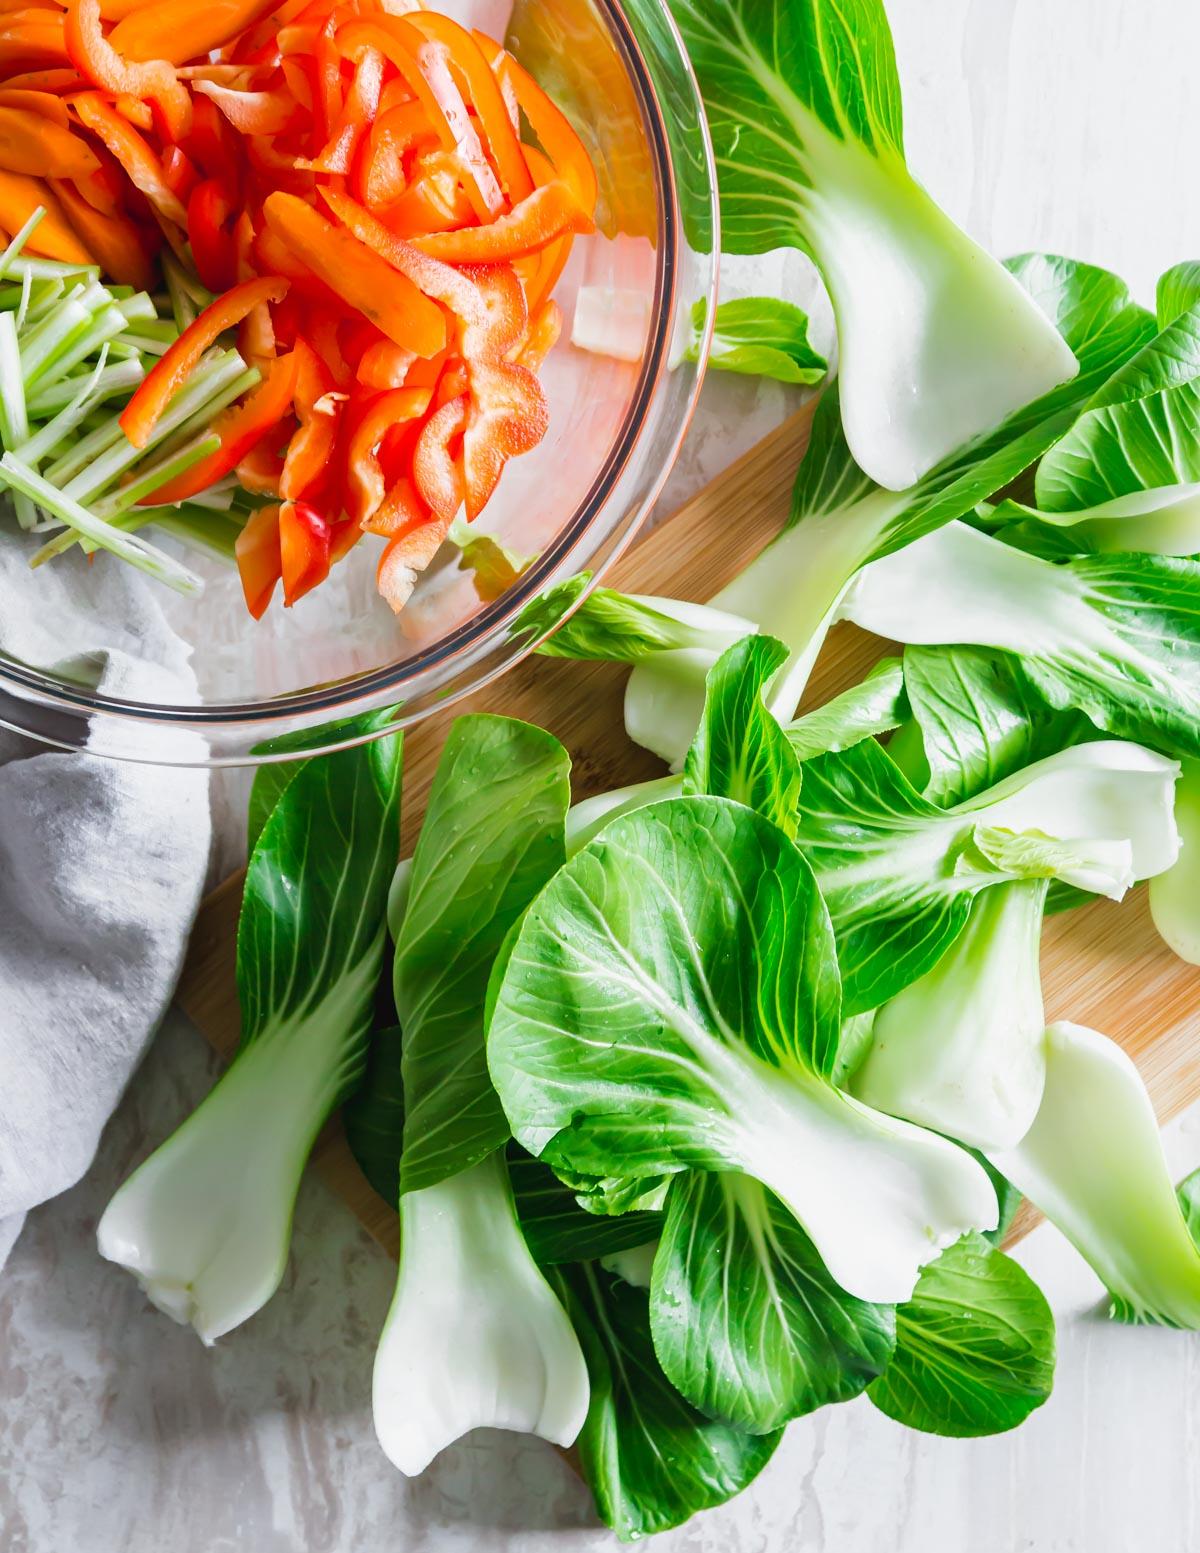 baby bok choy salad ingredients